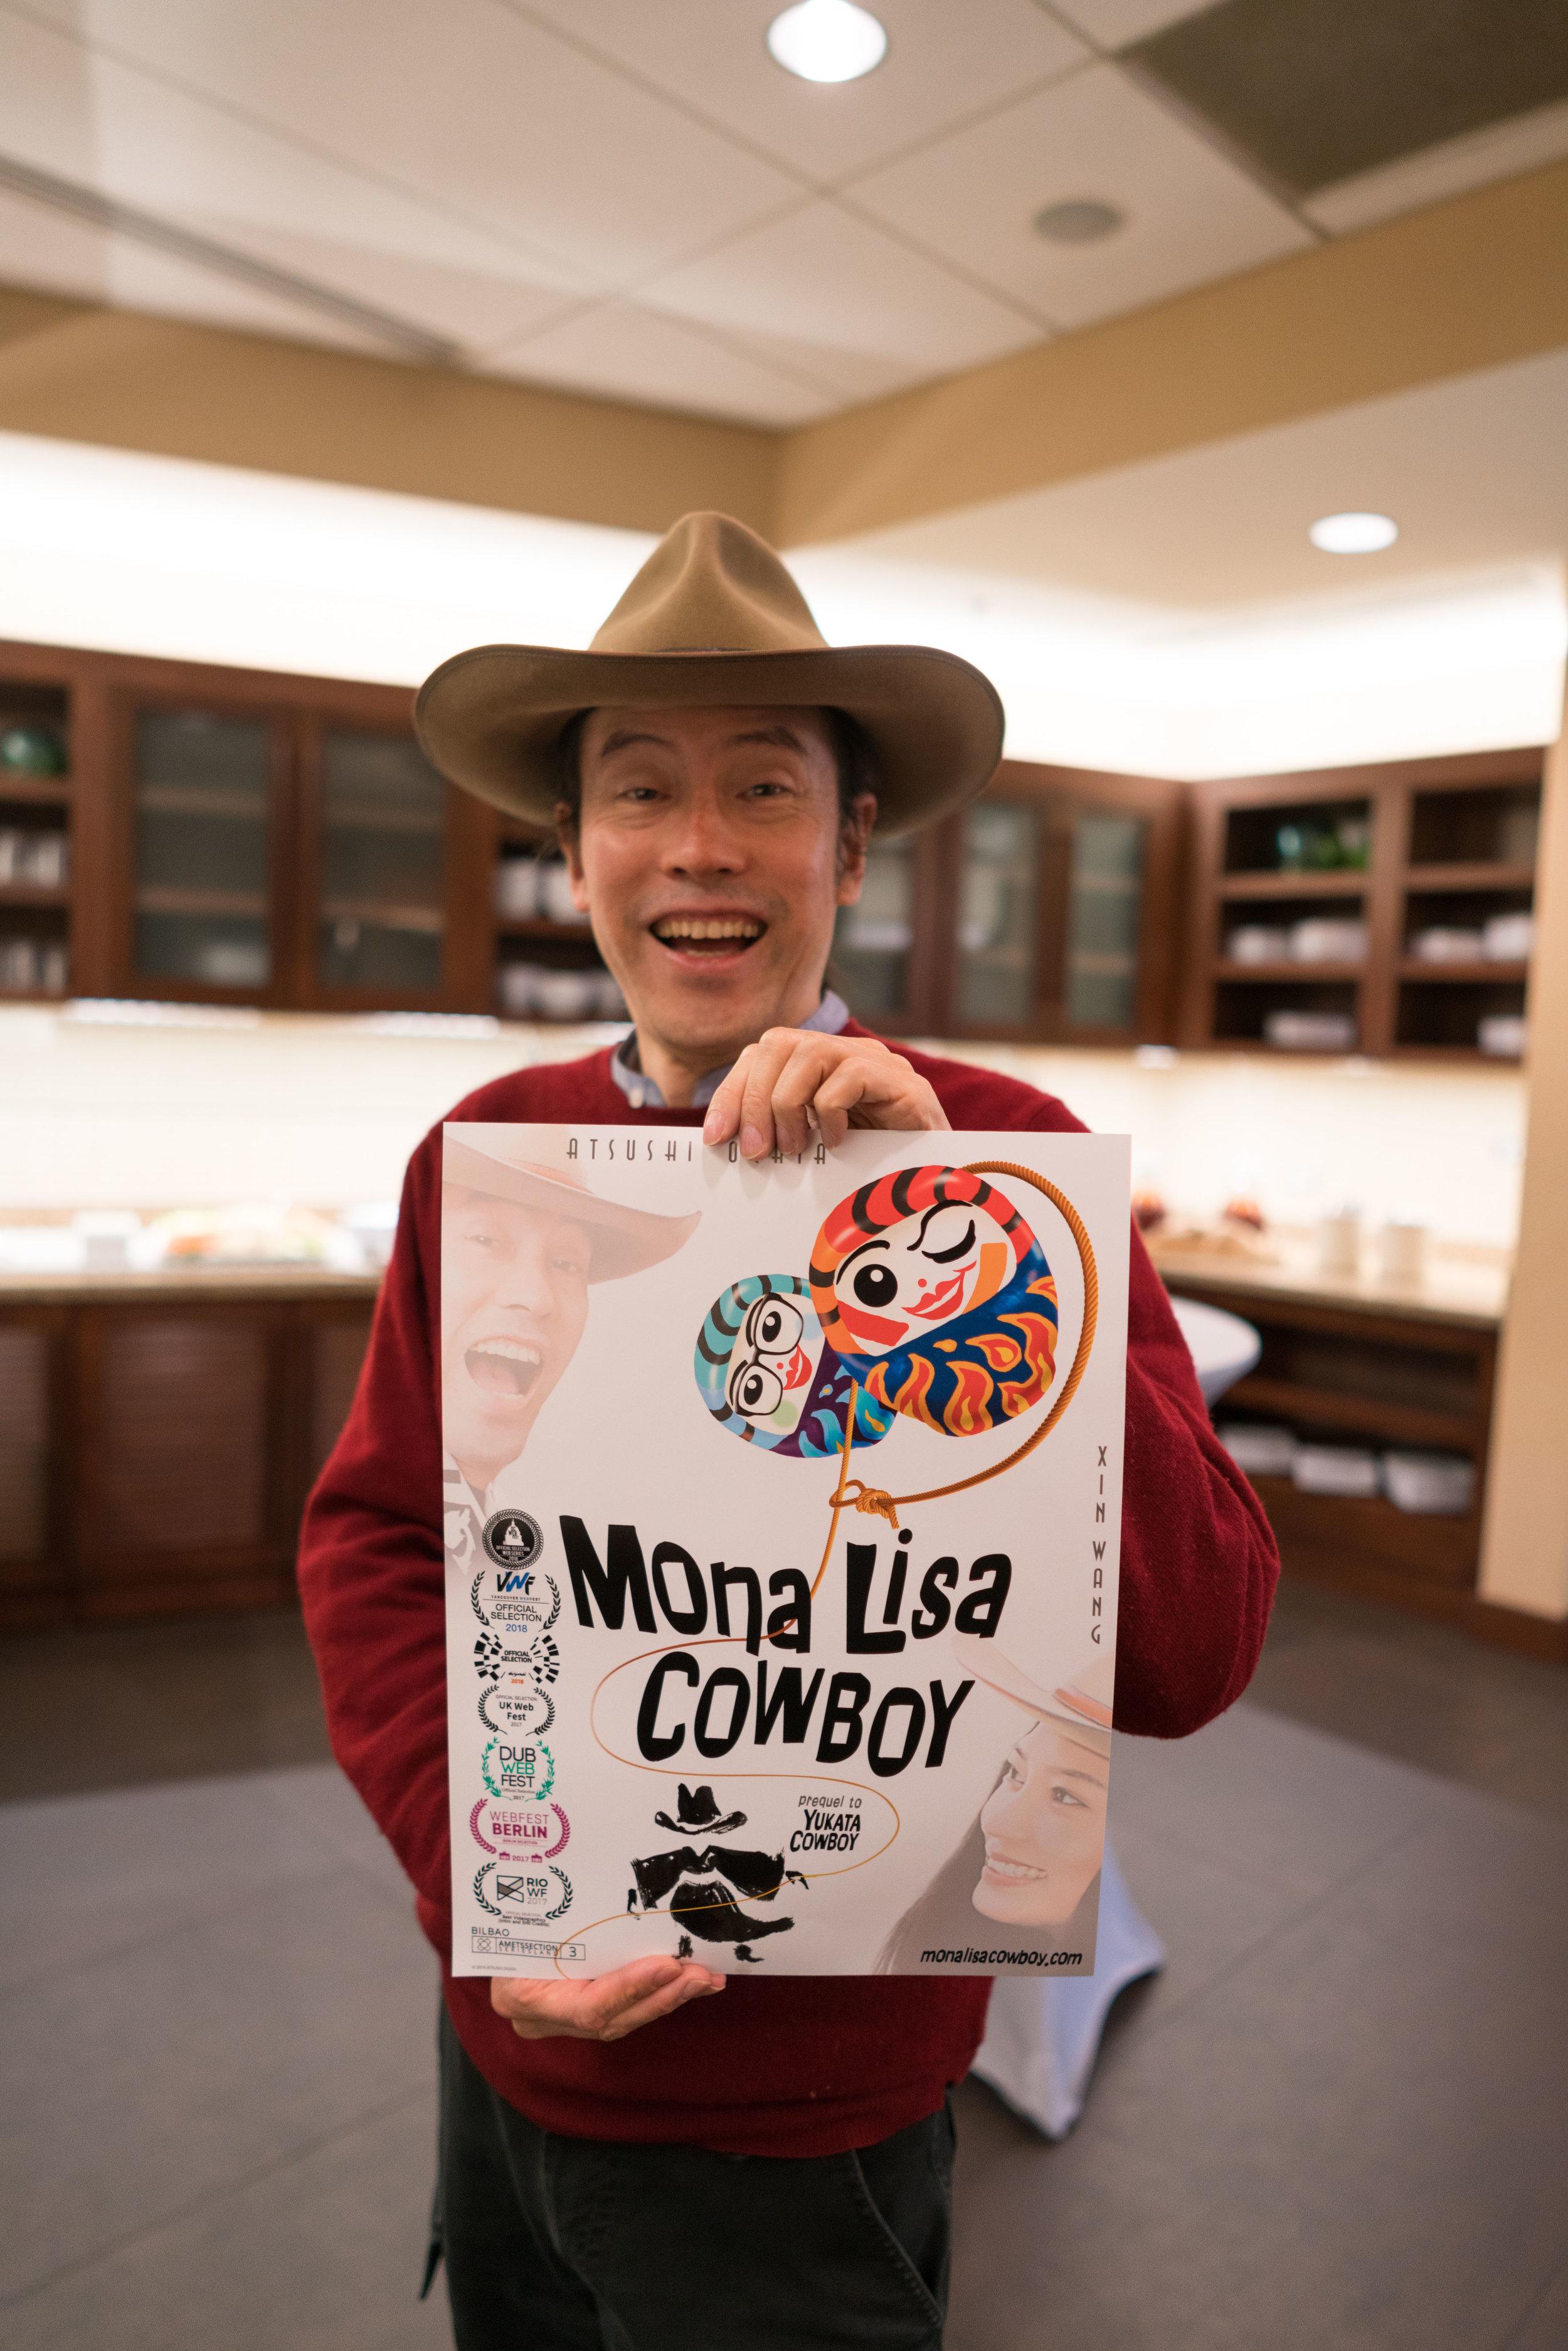 Atsushi Ogata (Monalisa Cowboy)